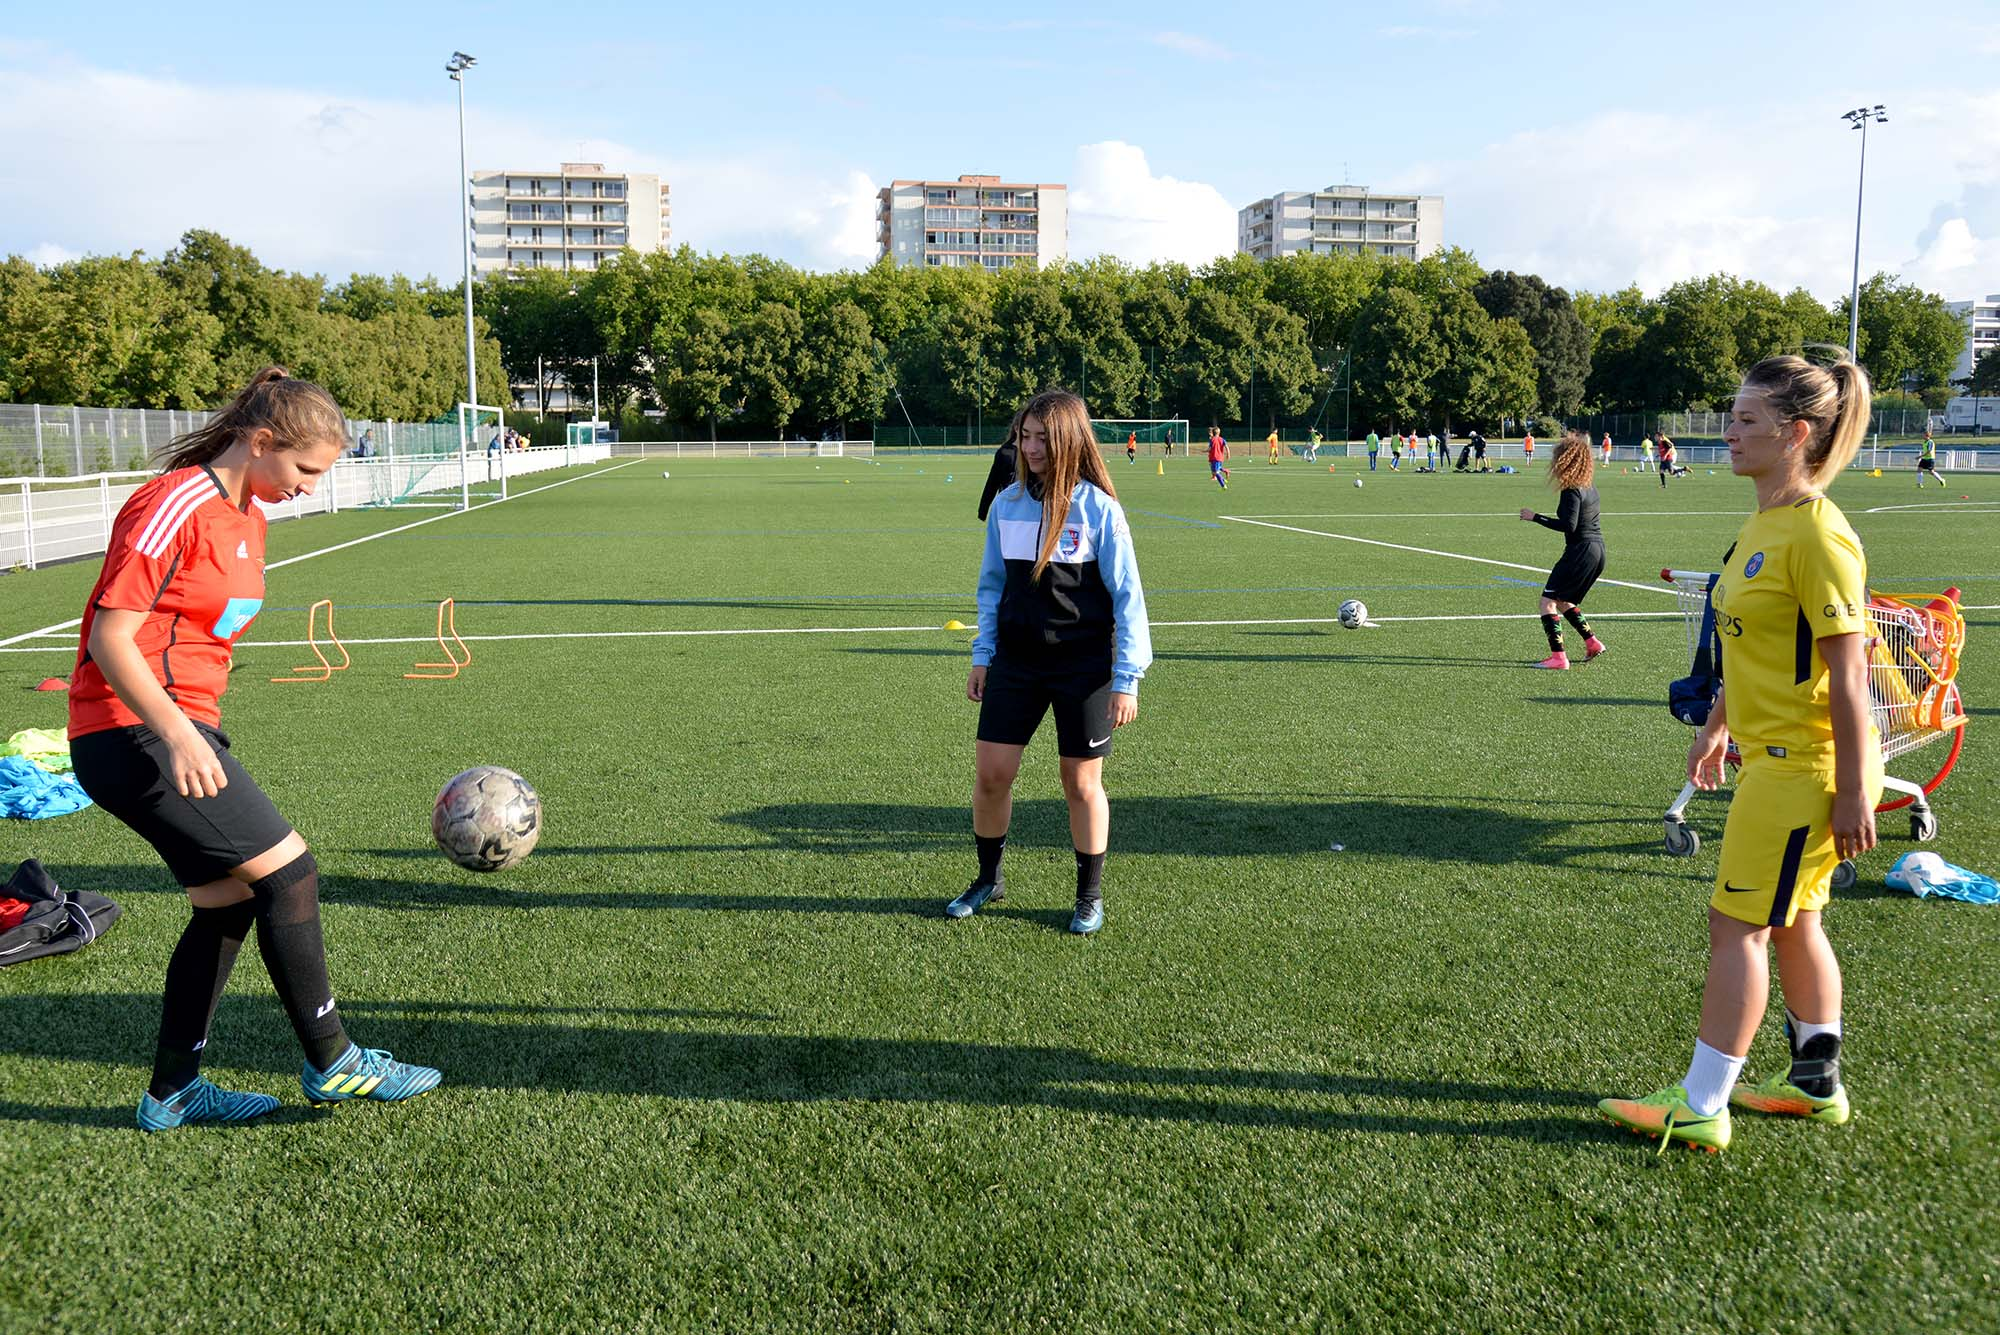 Luana Mendy, Sarah Gilard et Sandy Bennacer s'entraînent en équipe Senior. (©Ville de Saint-Nazaire - Christian Robert)